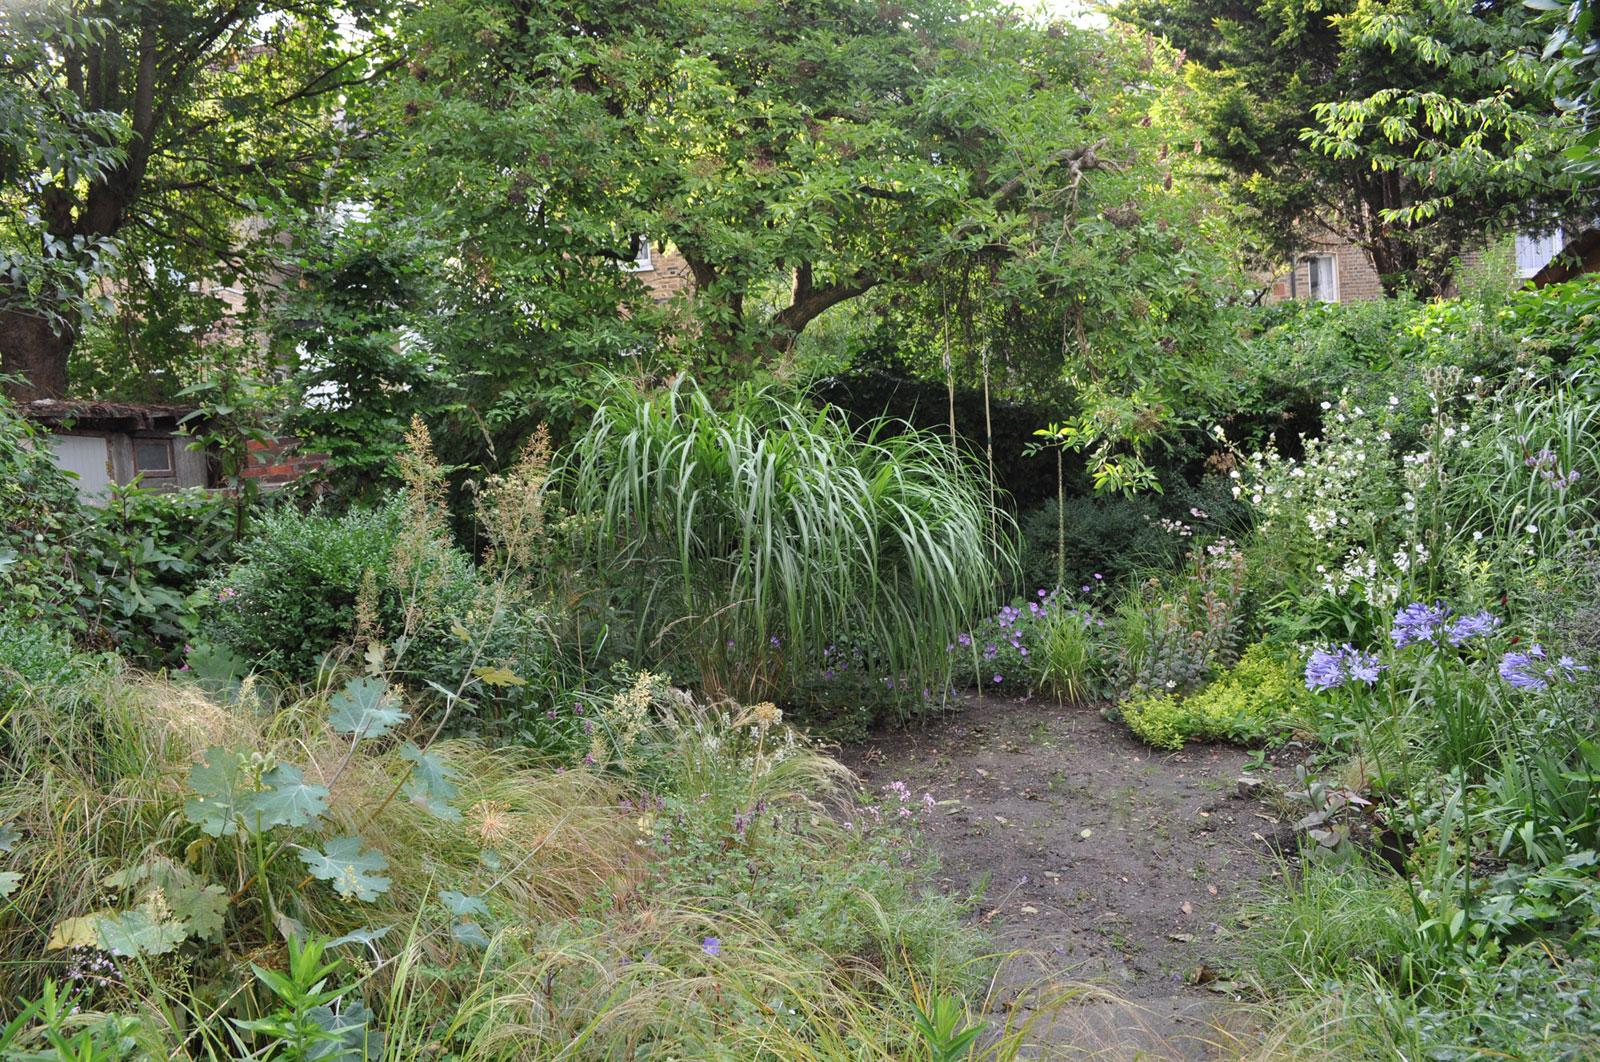 soft planting, romantic planting, meadow planting. perennial planting, naturalistic planting, planting design, urban garden design, city garden